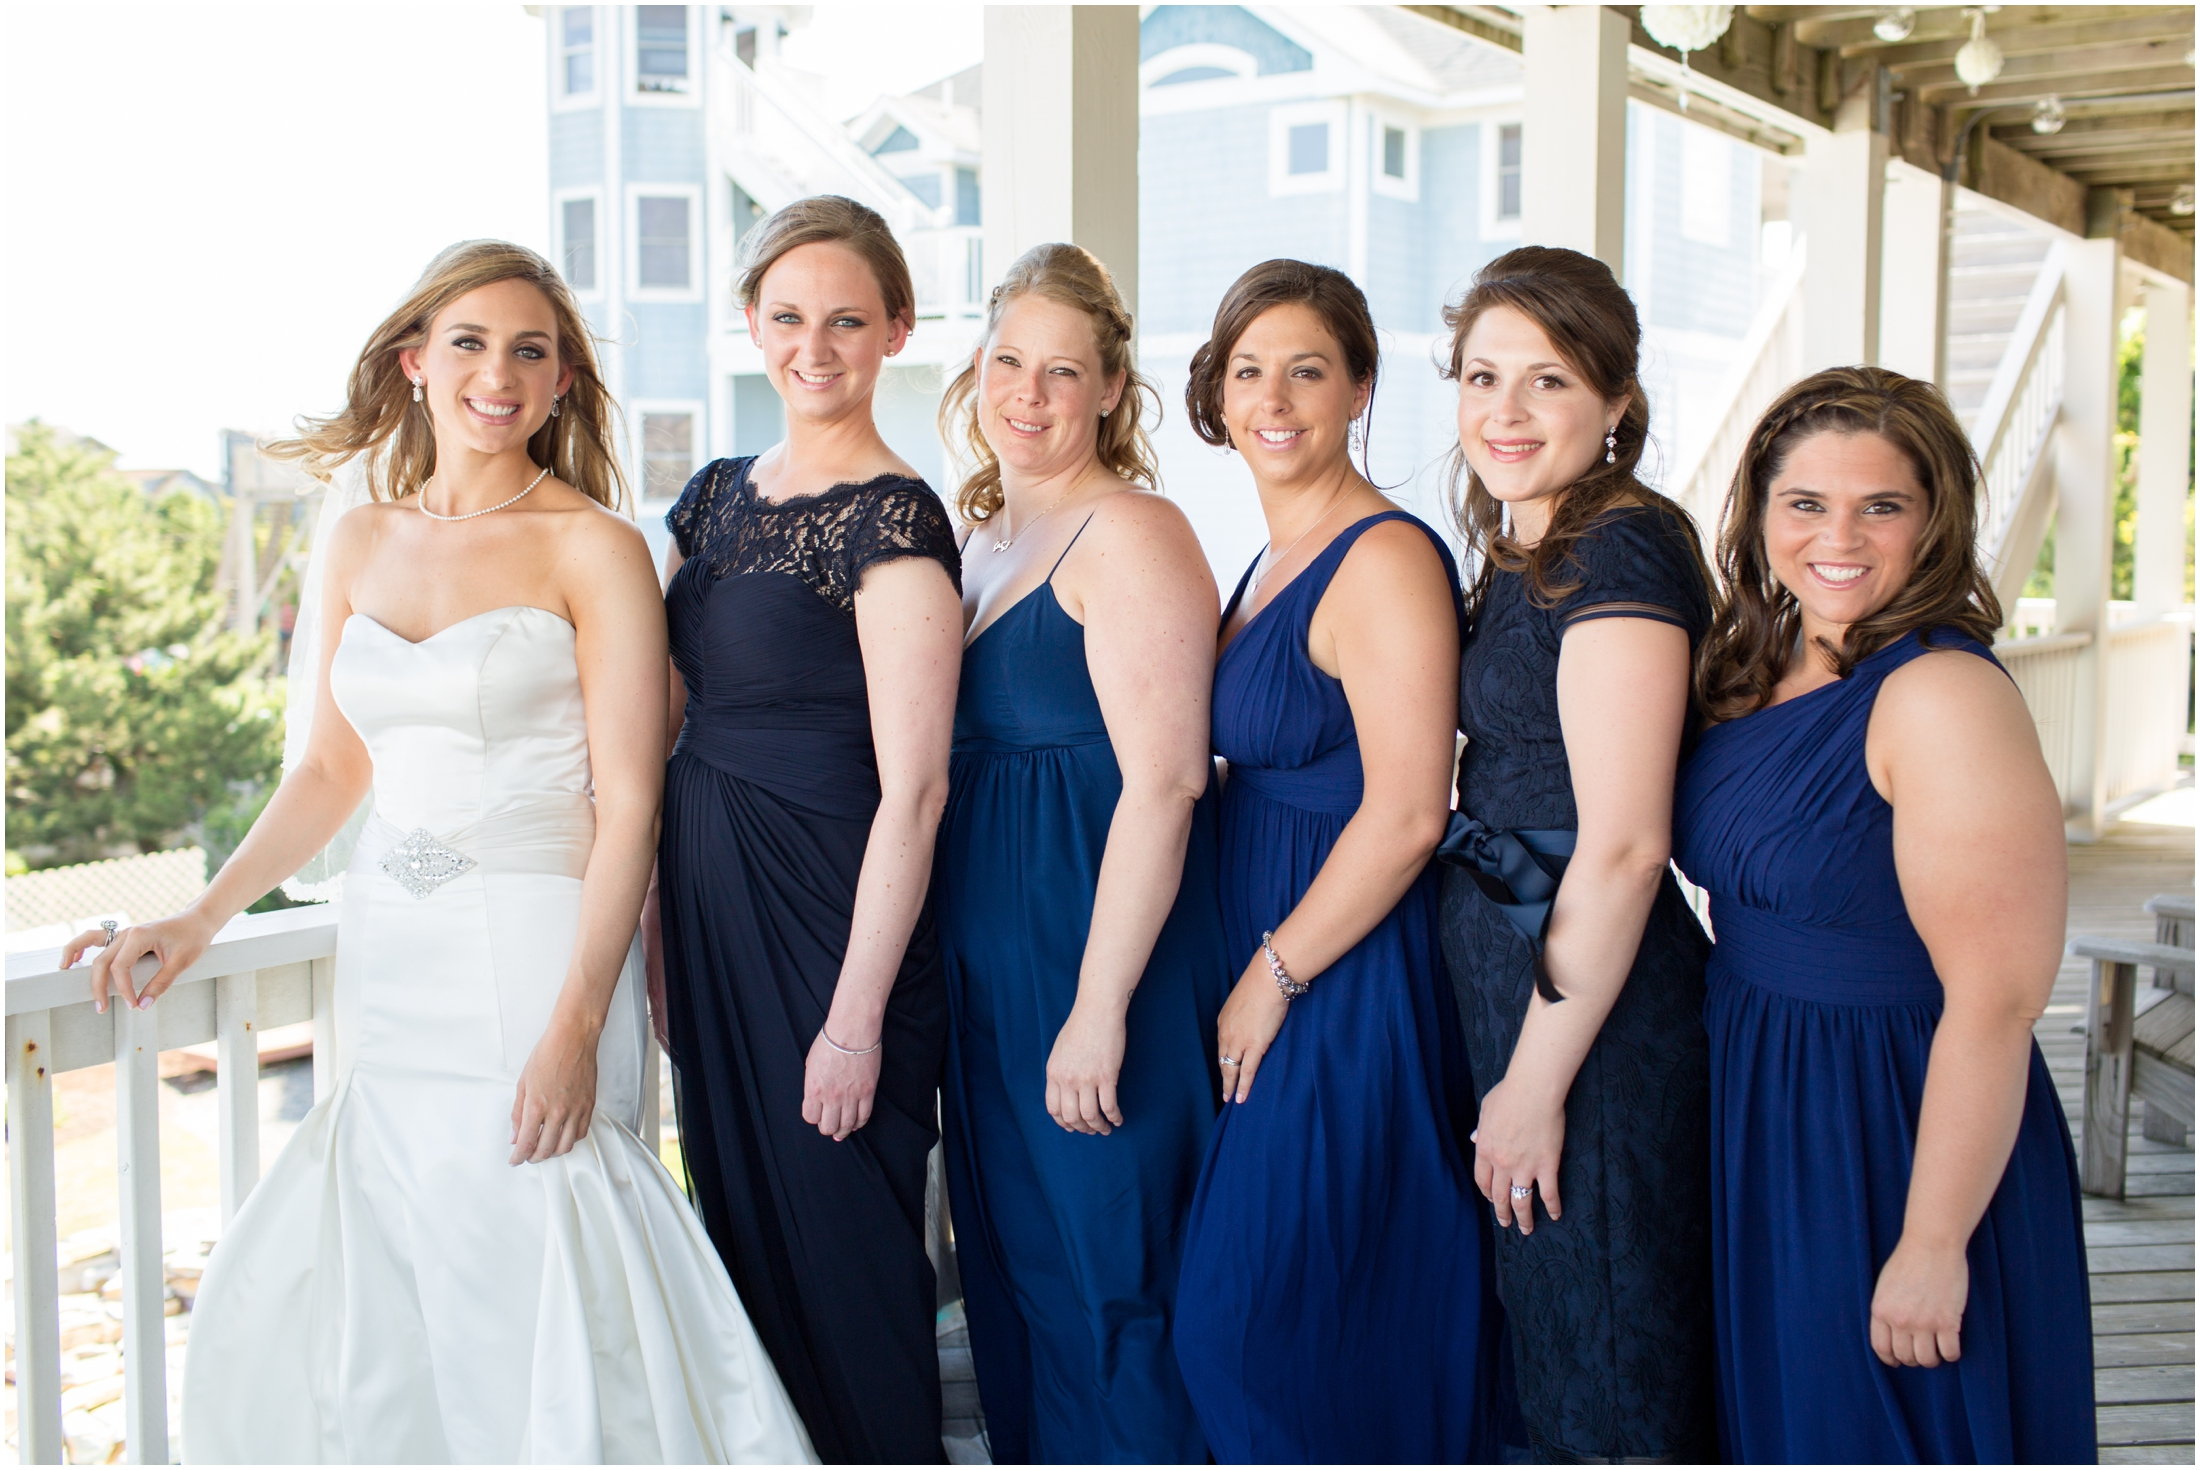 Pearce-Wedding-Bridal-Party-179.jpg